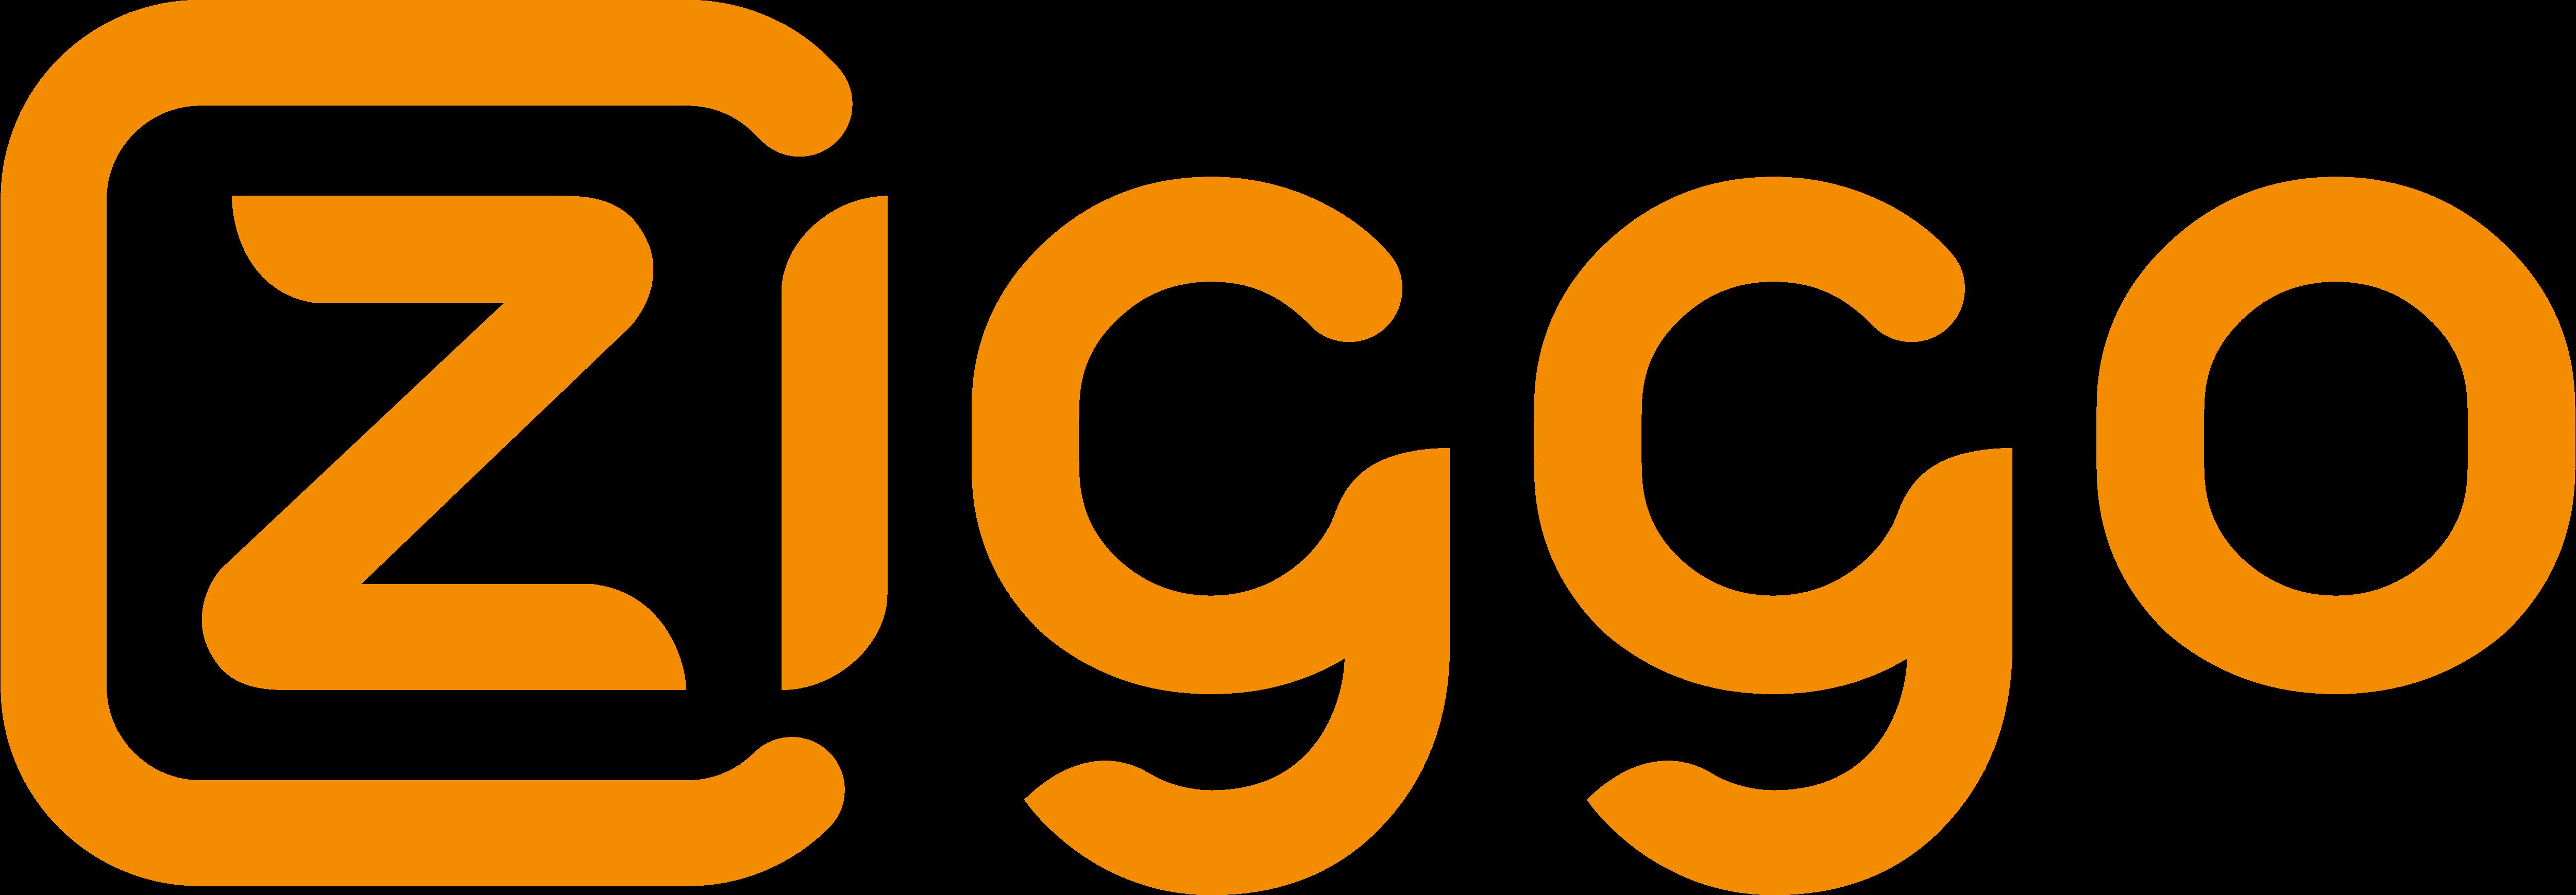 Ziggo – Logos Download